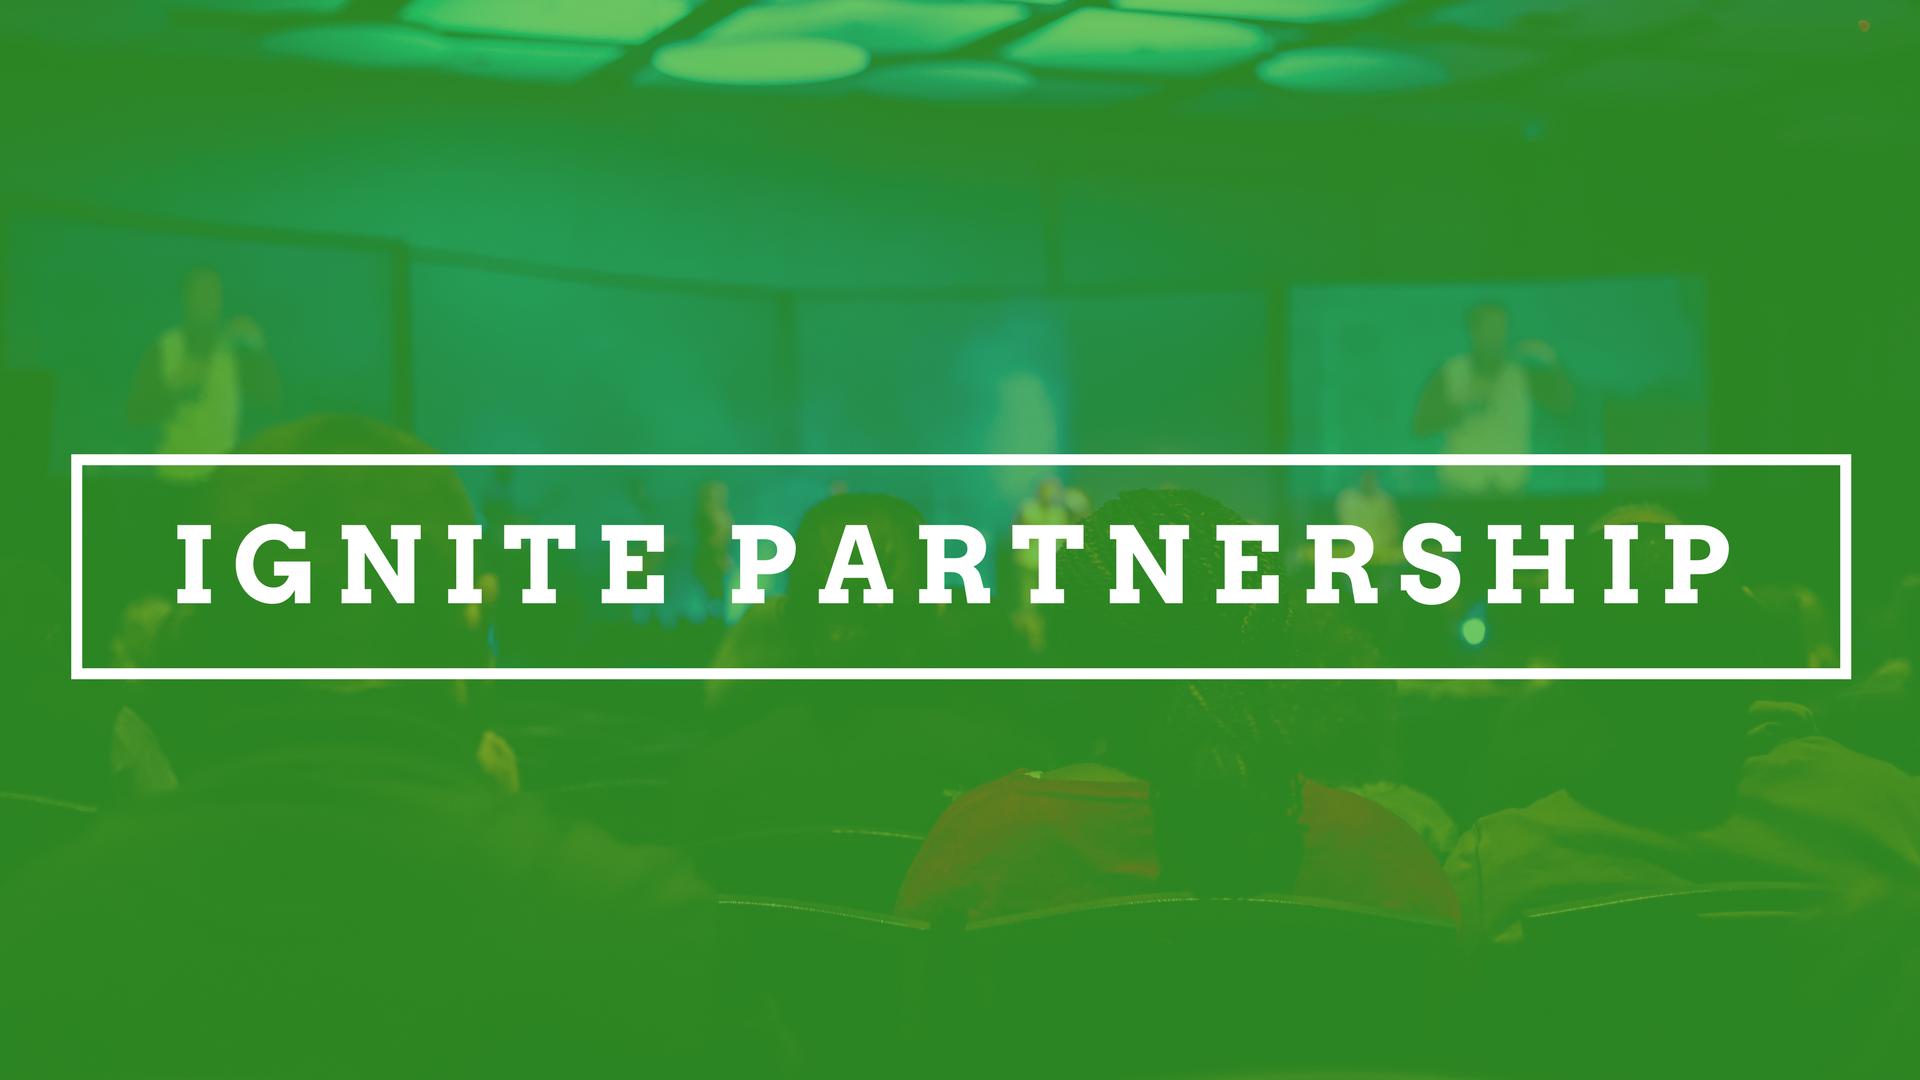 Ignite partnership wide 2